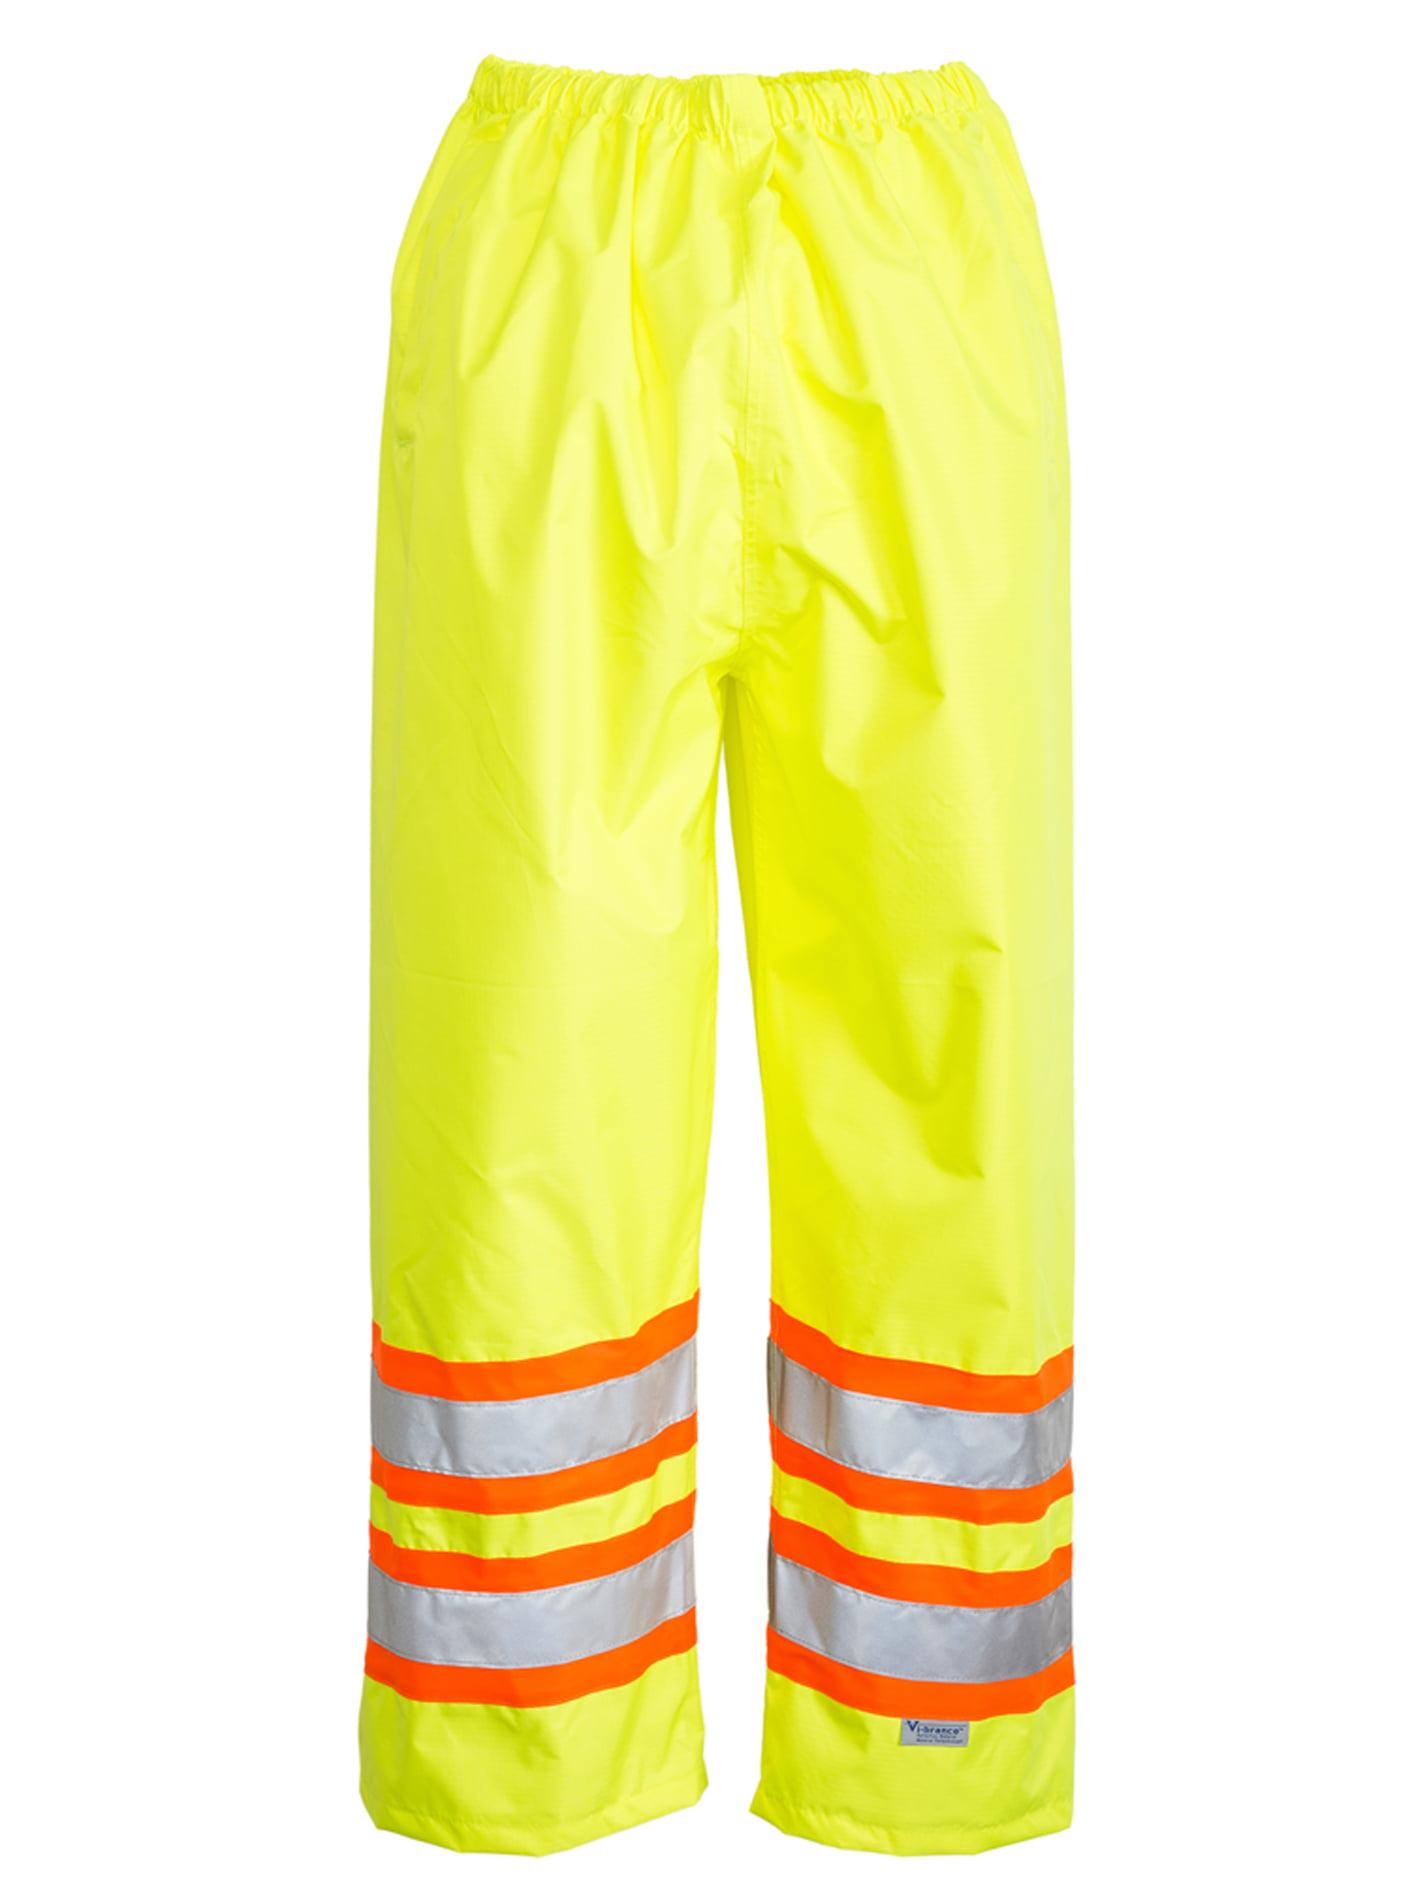 Men's Professional THOR 300D Trilobal Rip-stop Safety Waist Pants